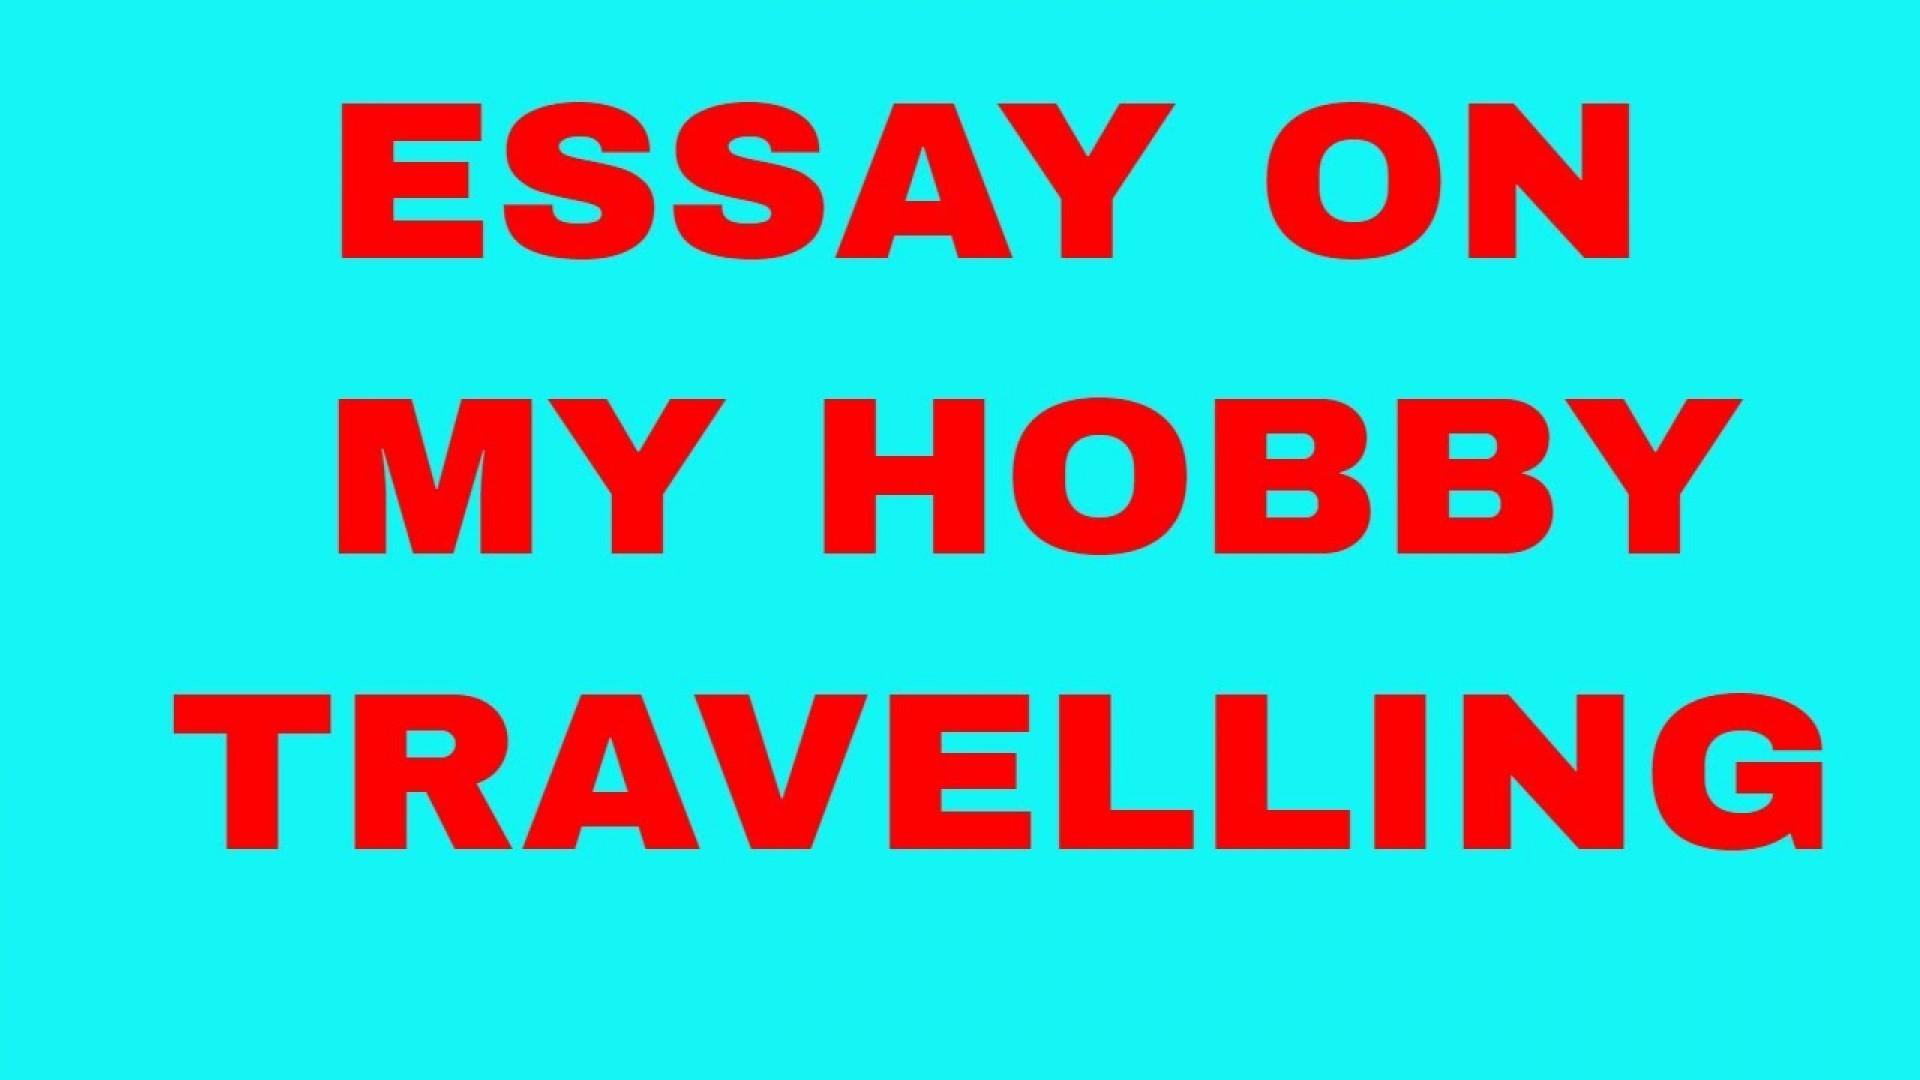 024 My Hobby Essay Maxresdefault Impressive In Urdu Class 7 Hindi Cricket Marathi 1920